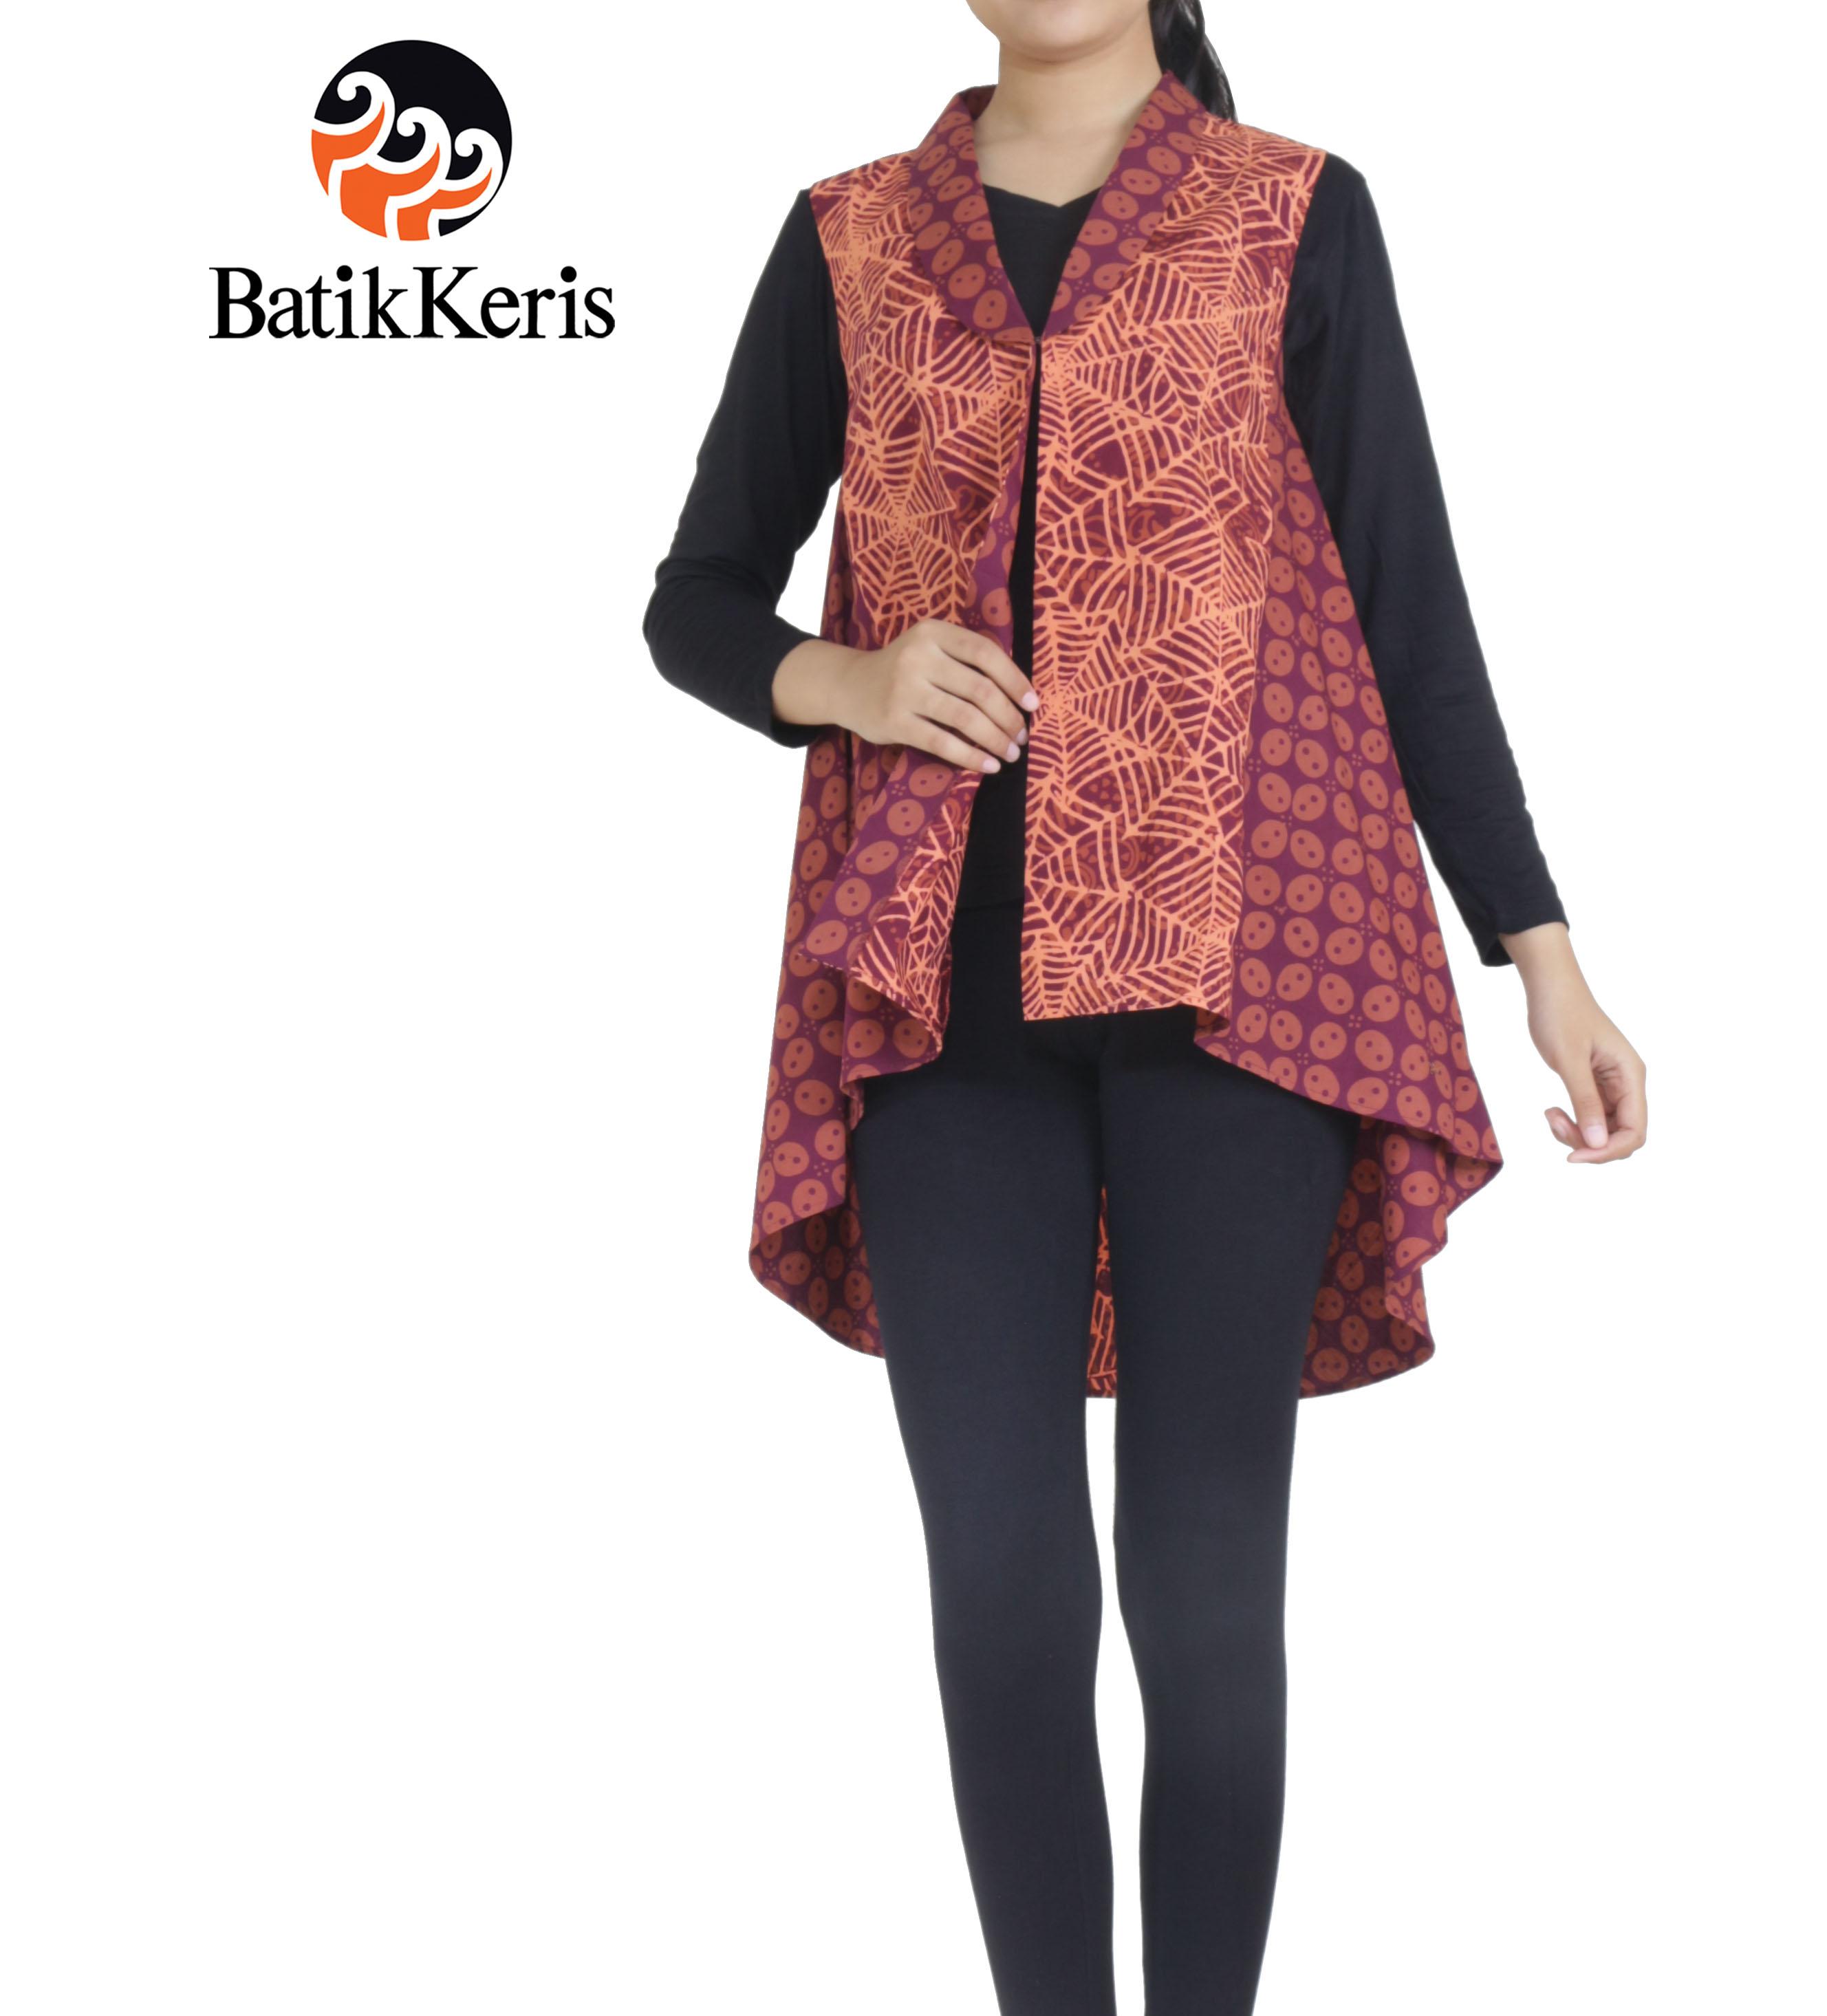 Batik Keris Warna Merah: OUTER BATIK MOTIF KEMBANG API KOMBINASI